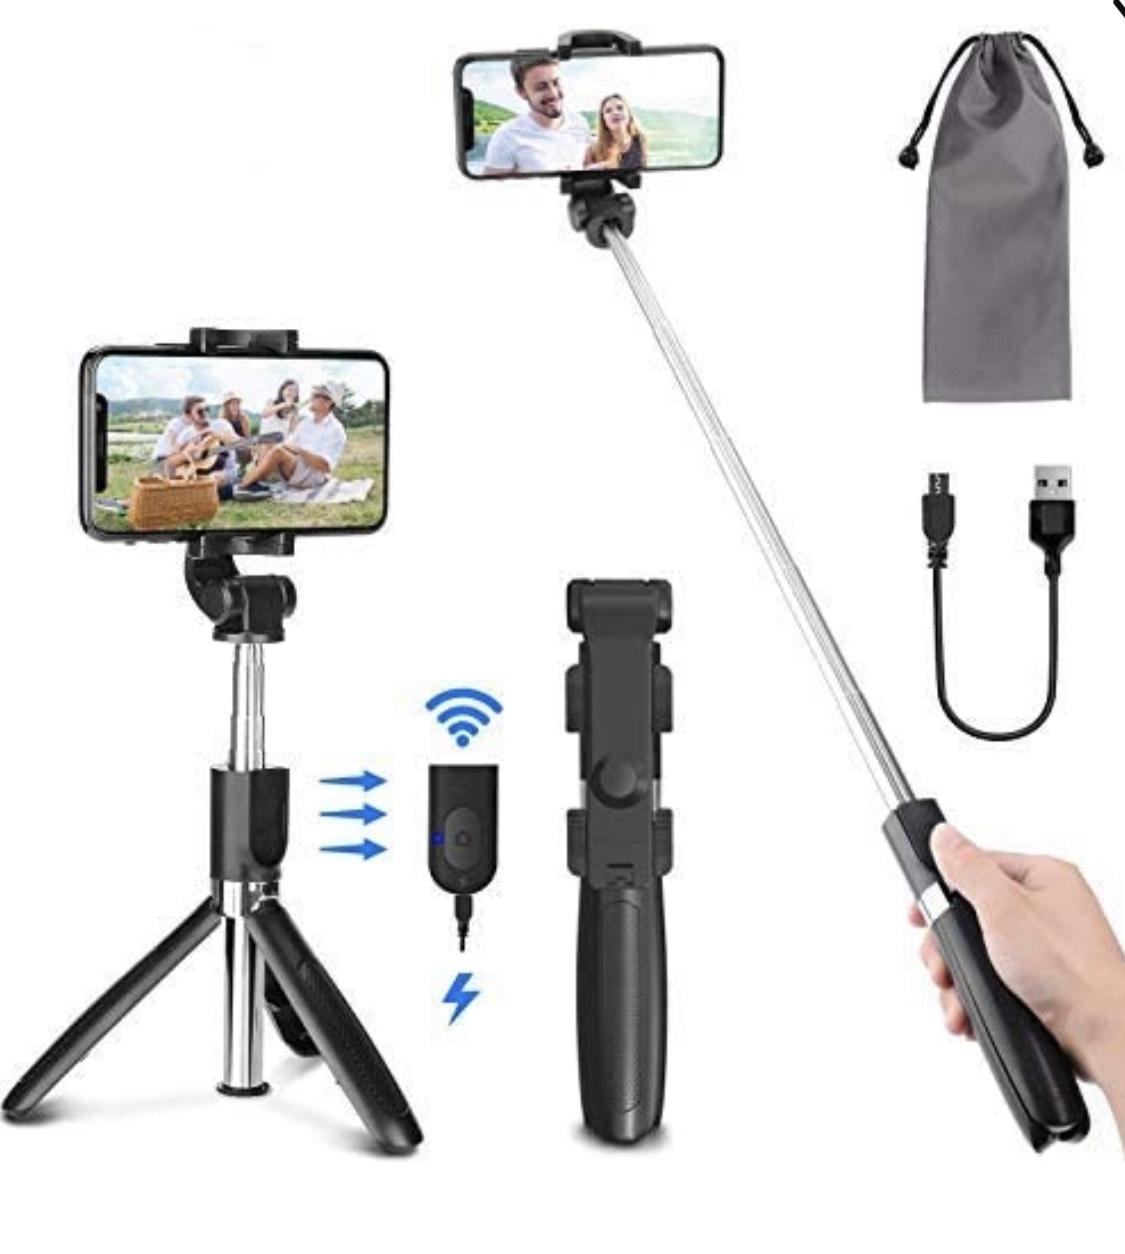 Treppiede Bluetooth Selfie stick con telecomando Bluetooth ricaricabile